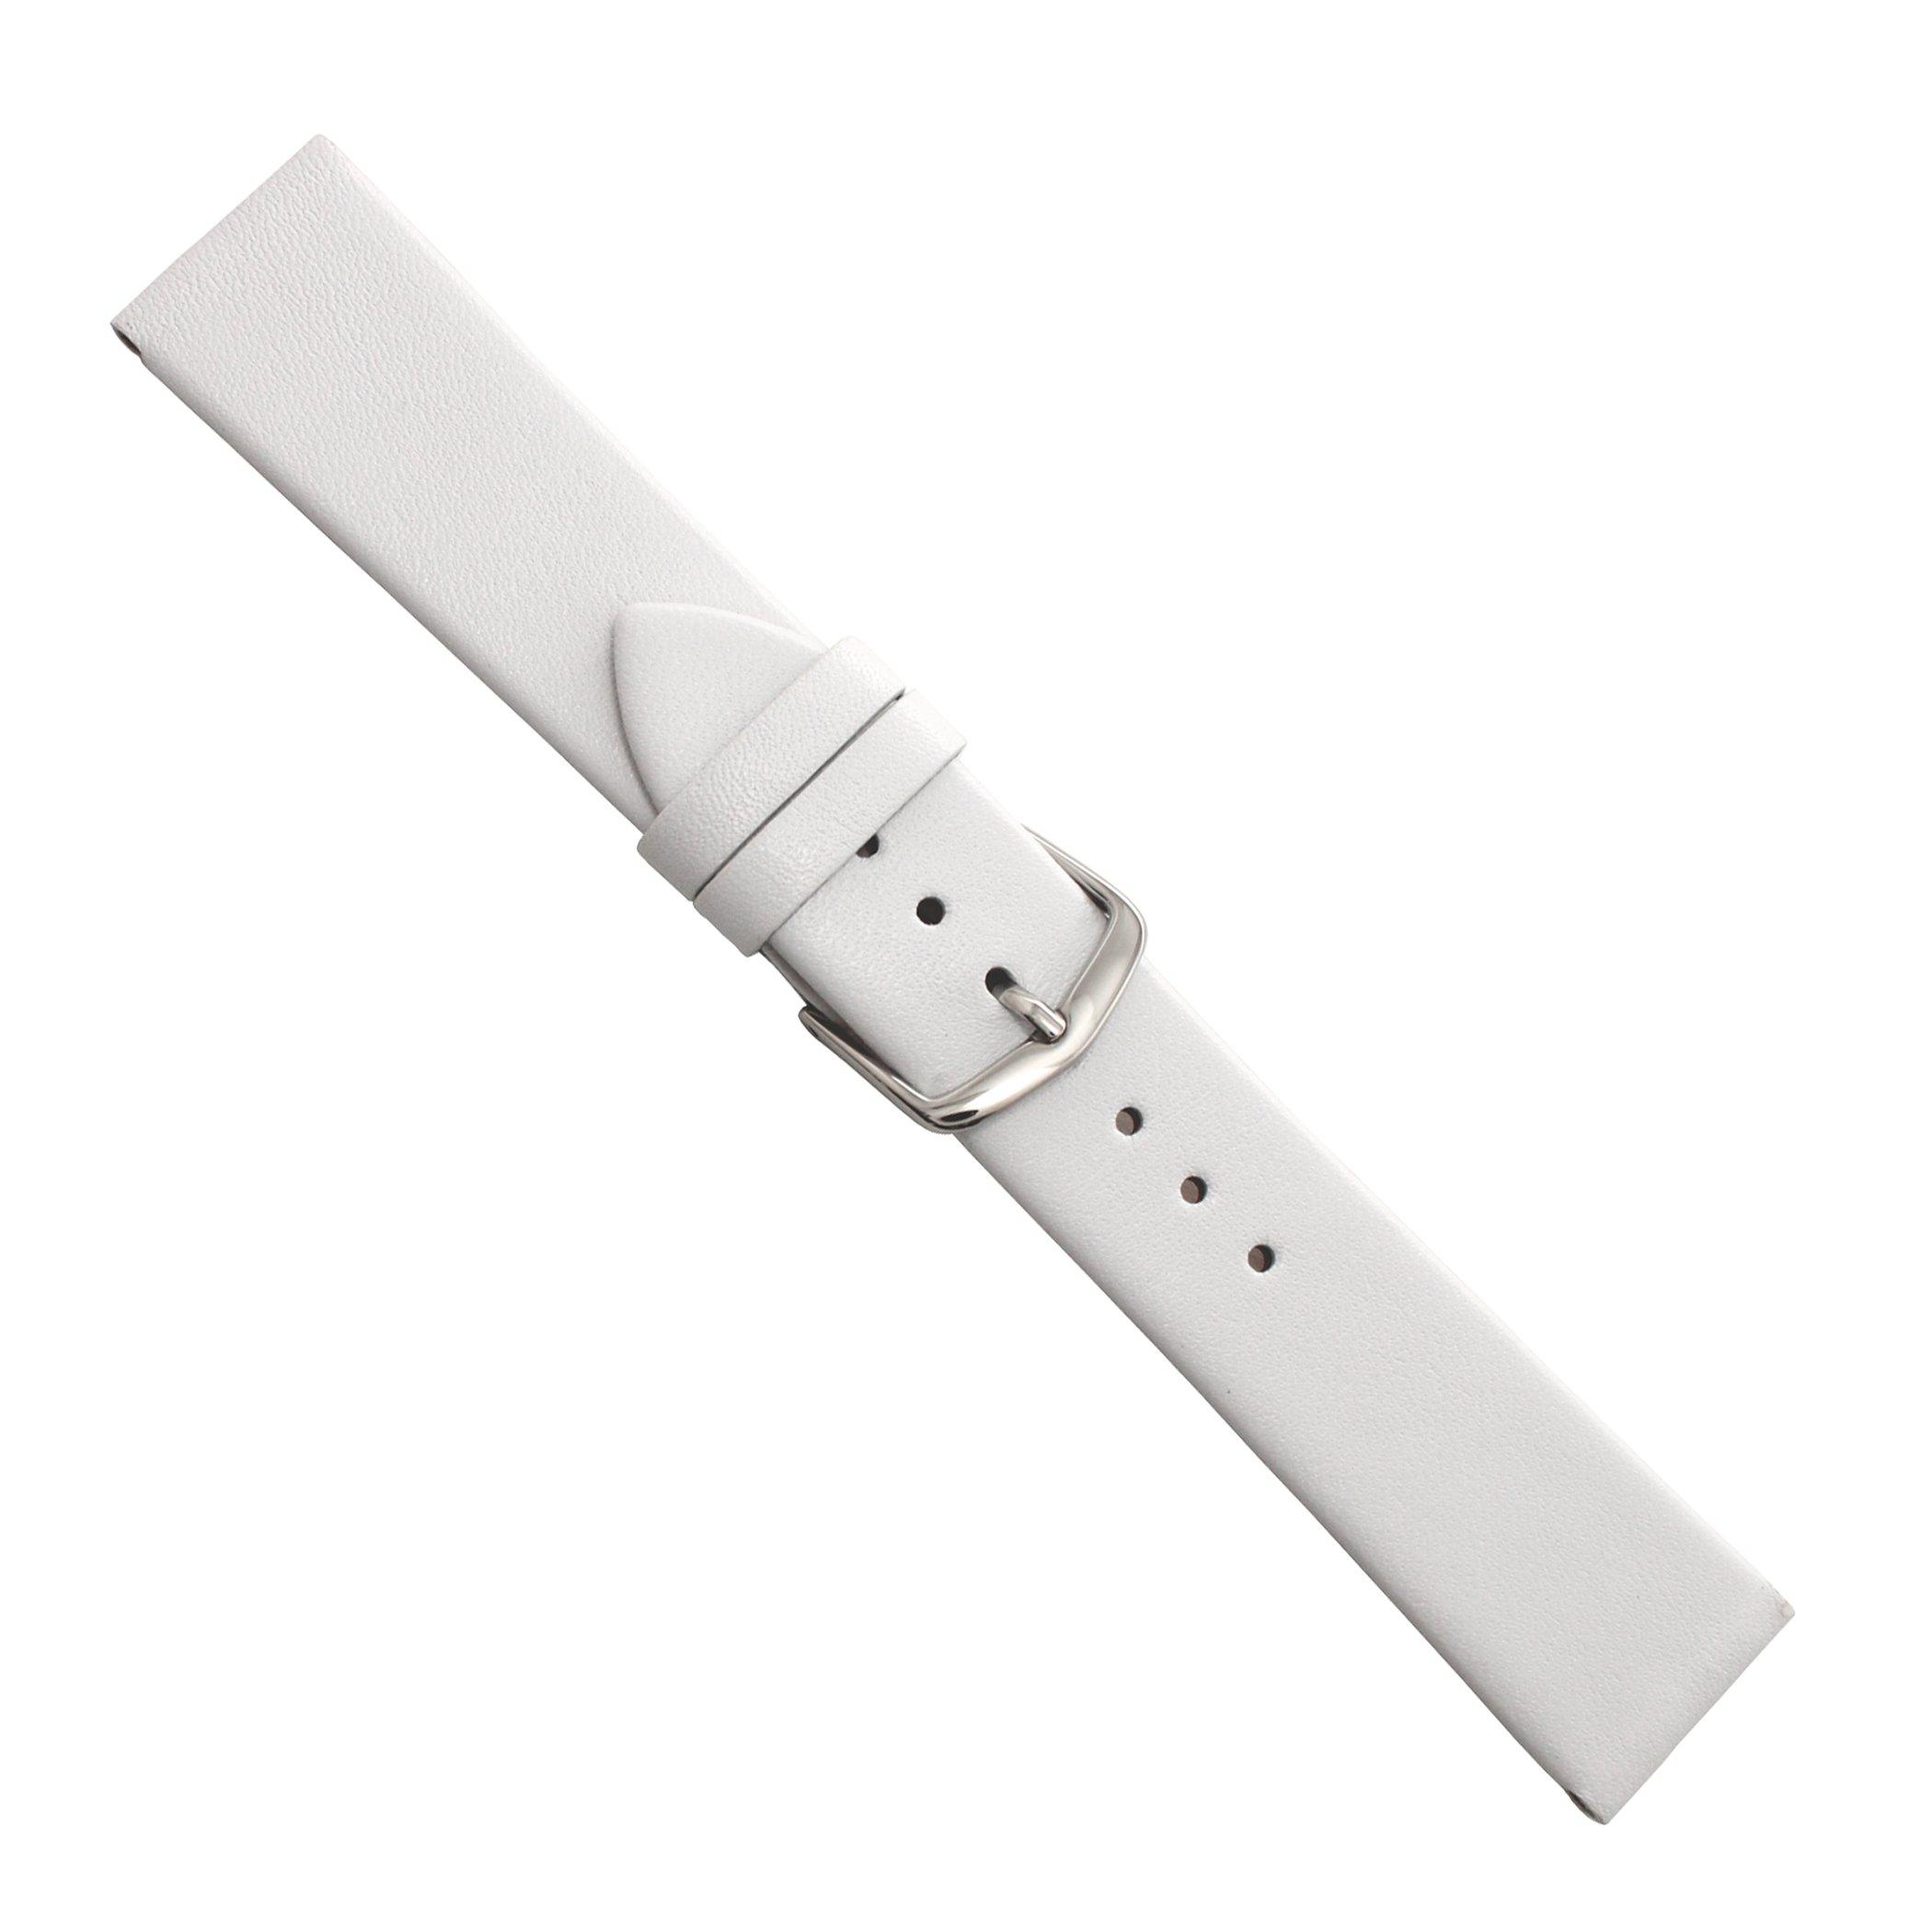 Uhrbanddealer-Damen-Uhrenarmband-New-Style-XS-Kalbsleder-Wei-16mm-Extra-Kurz-1711162s